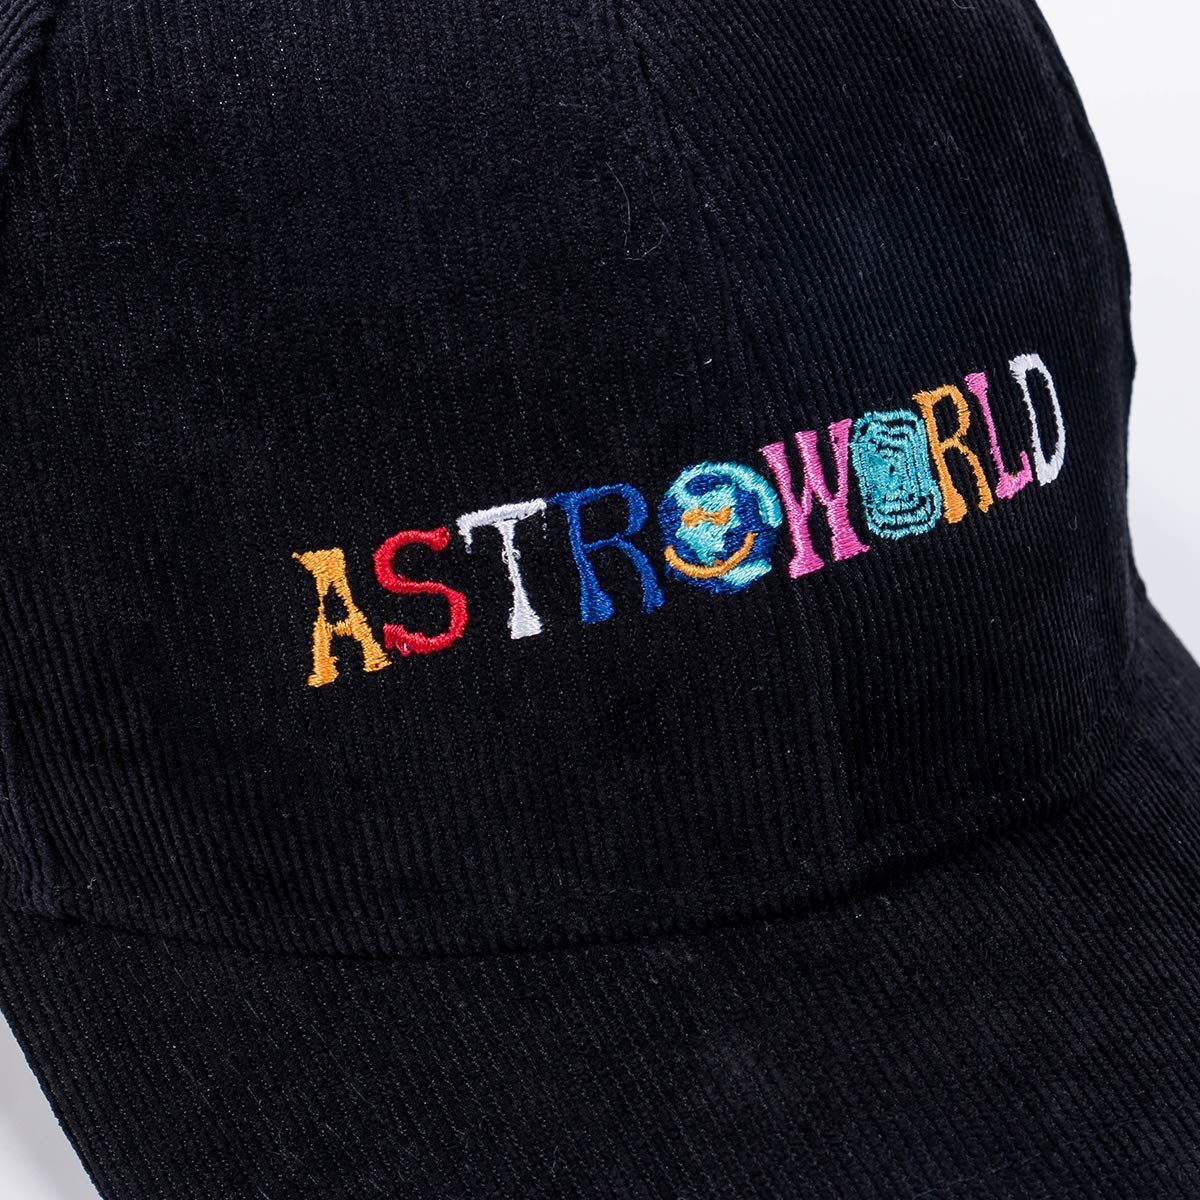 Unisex Dad Hat Travis Scott Astroworld Baseball Cap Corduroy Snapback Cap  Hip Hop Bone Garros Snapbacks (Black) at Amazon Men s Clothing store  8eeebee5451a